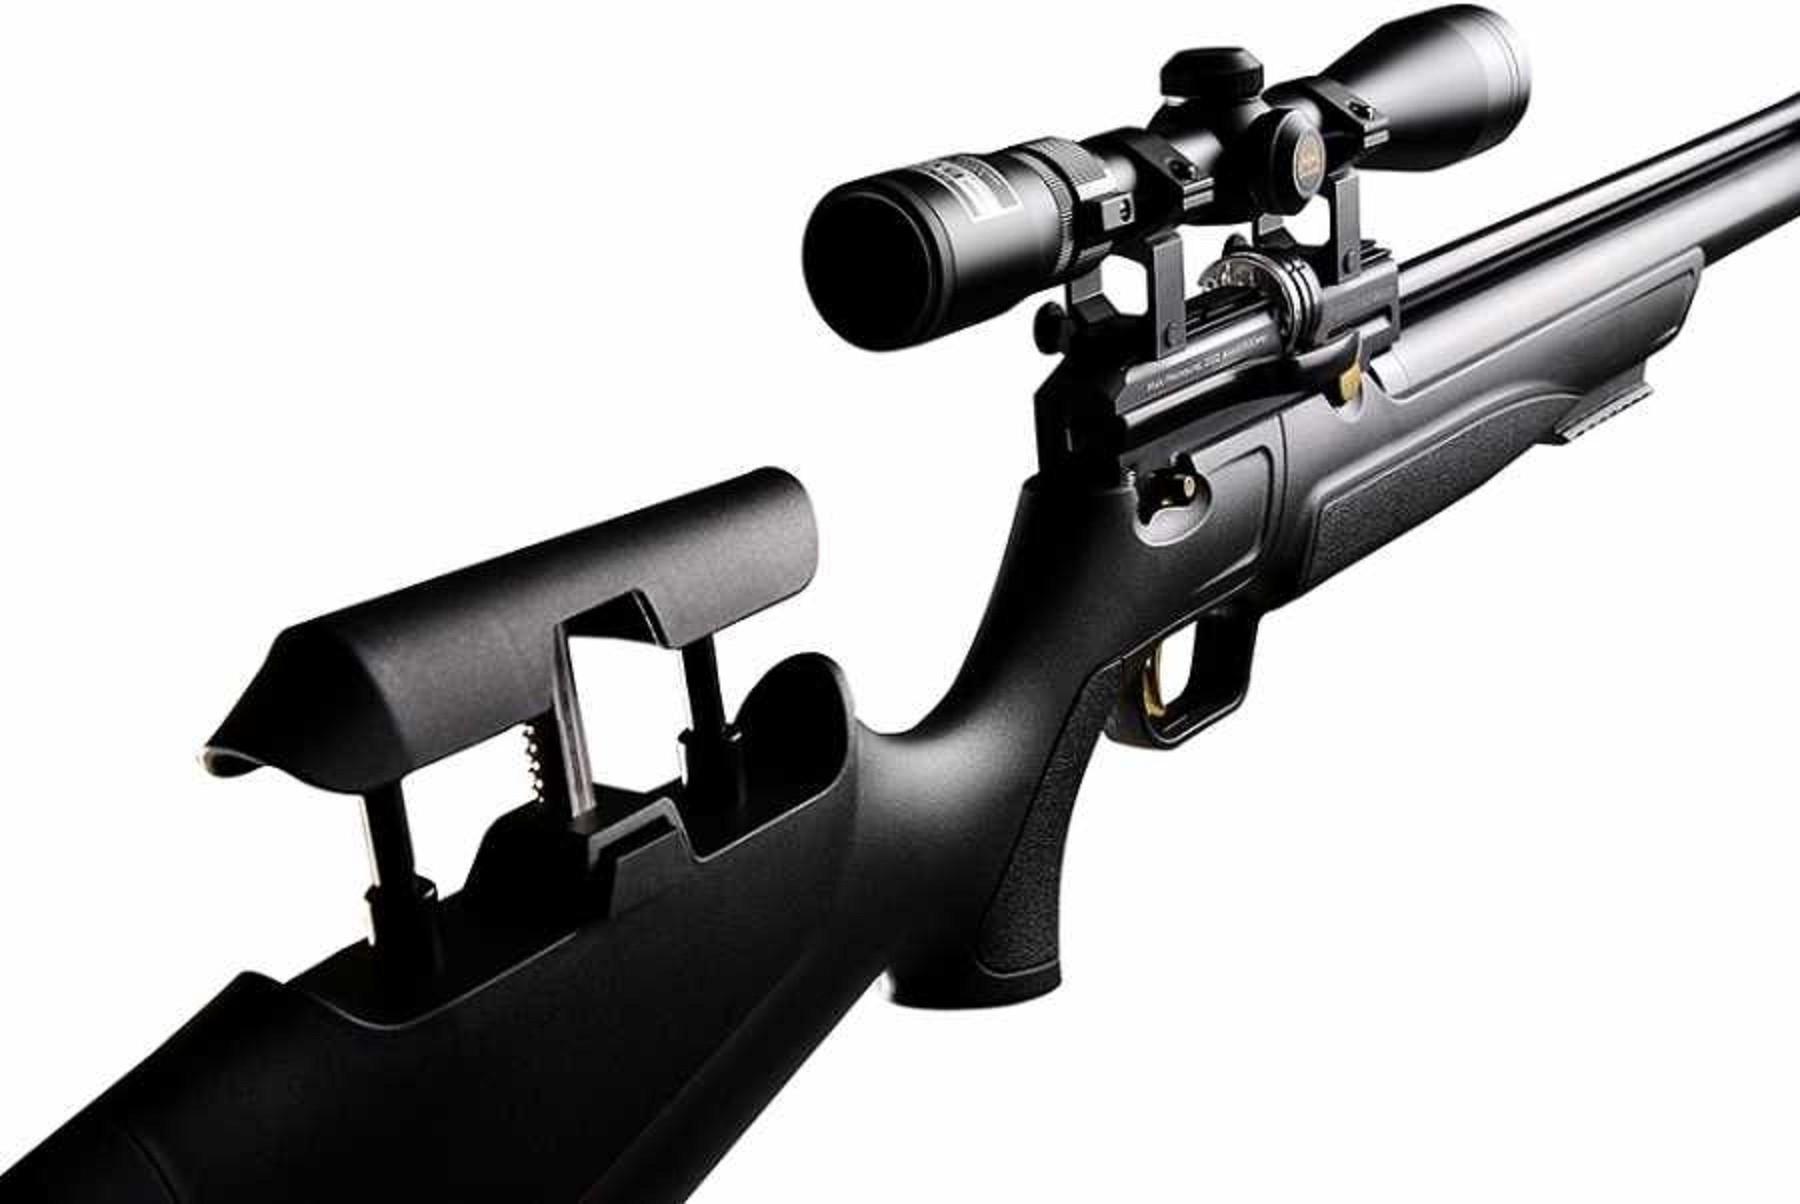 Carabina PCP Kral Puncher S 5.5mm